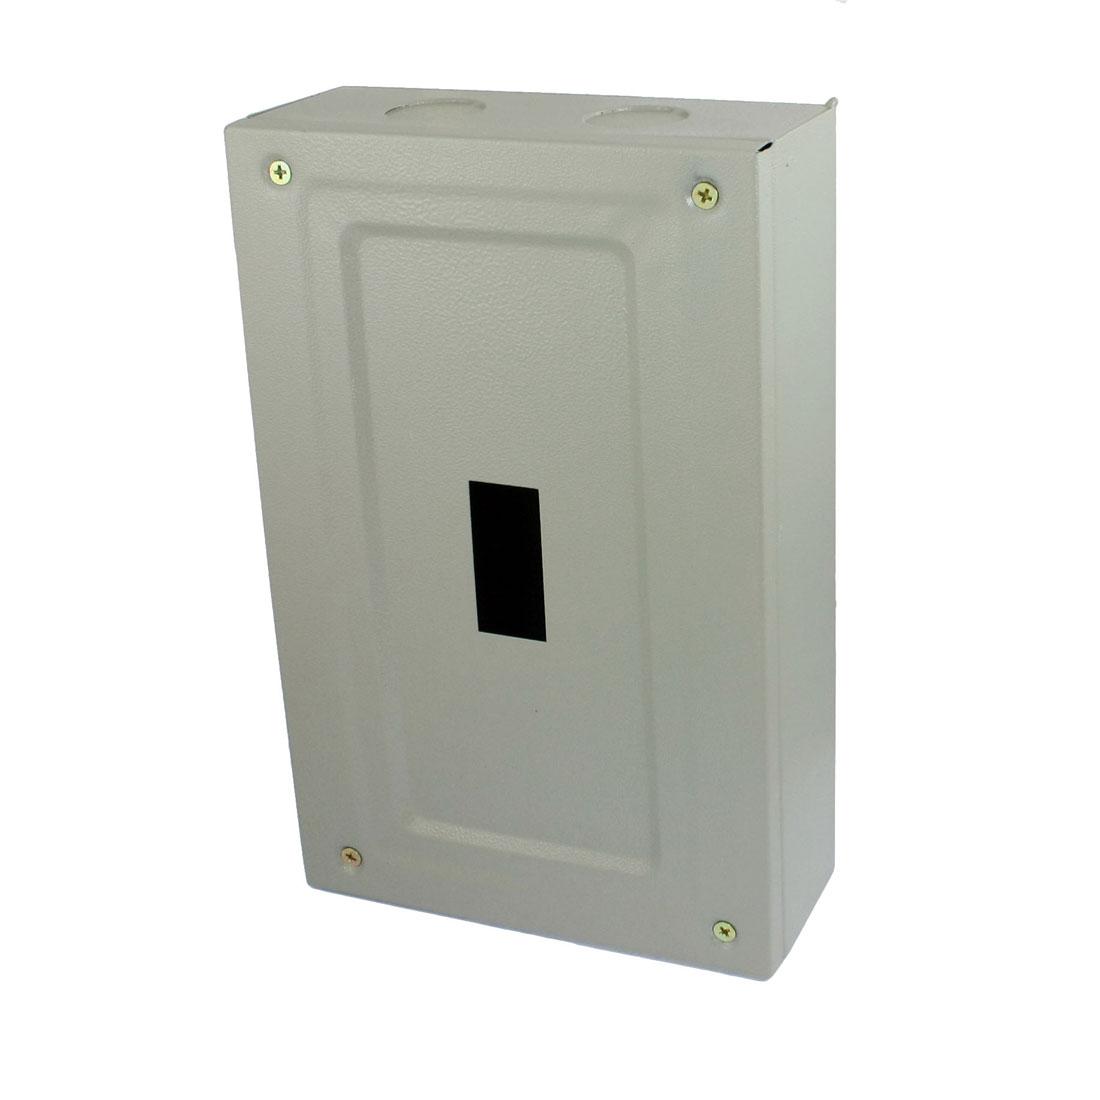 Rectangular Gray Metal Main Distribution Box Guard Cover